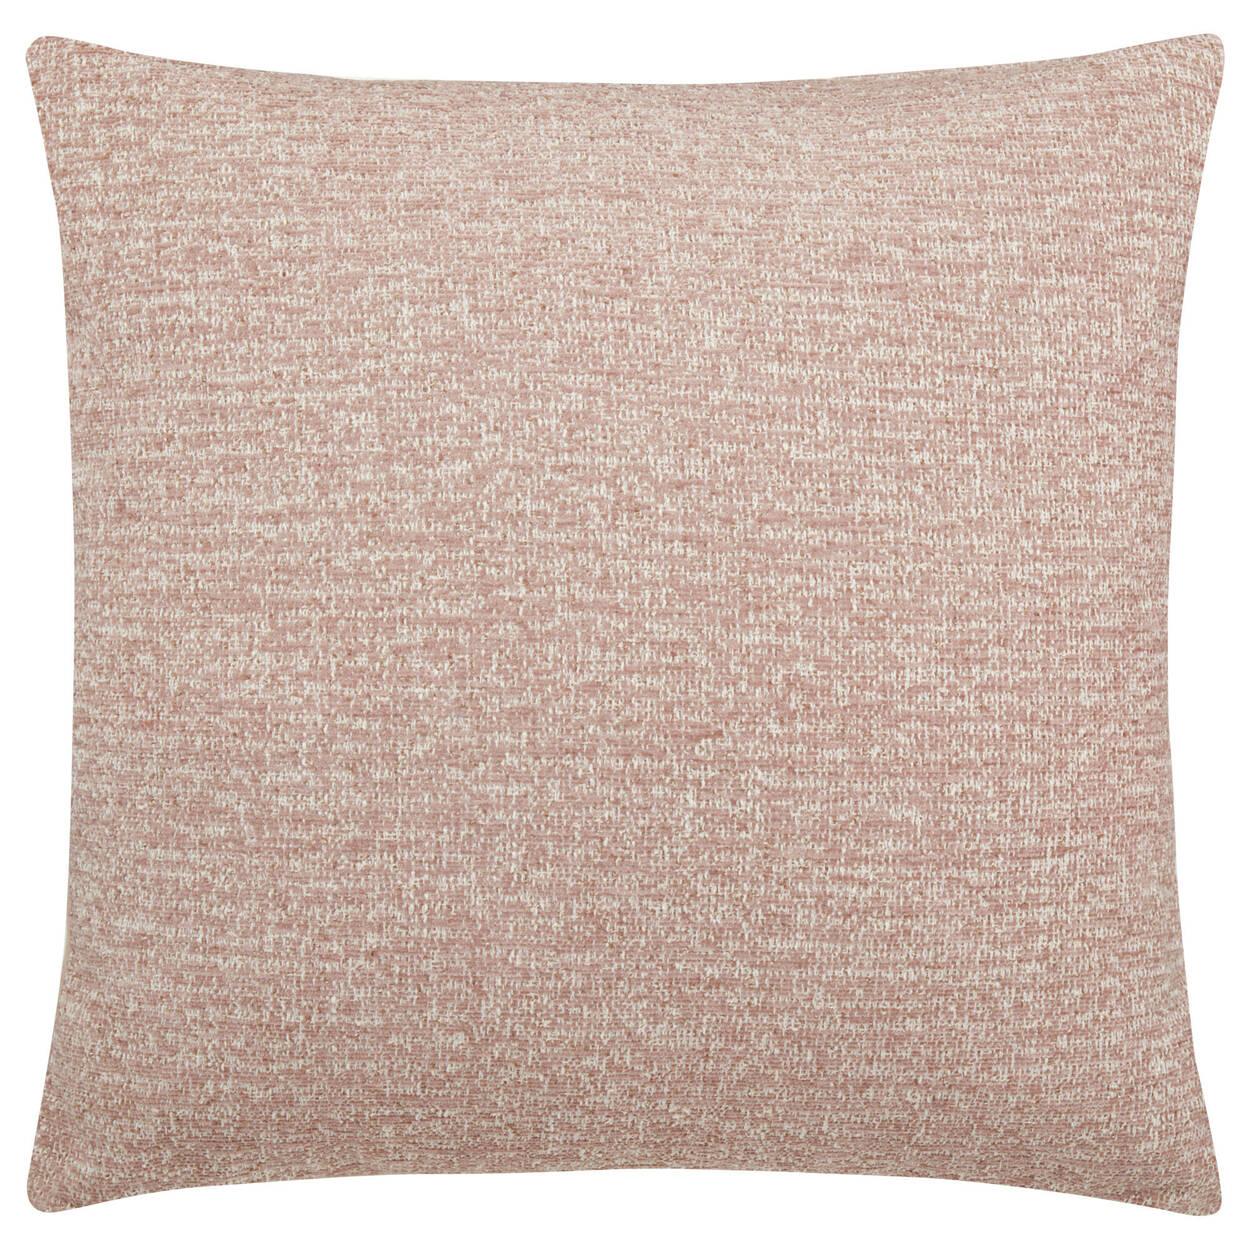 "Dalek Decorative Pillow 19"" x 19"""